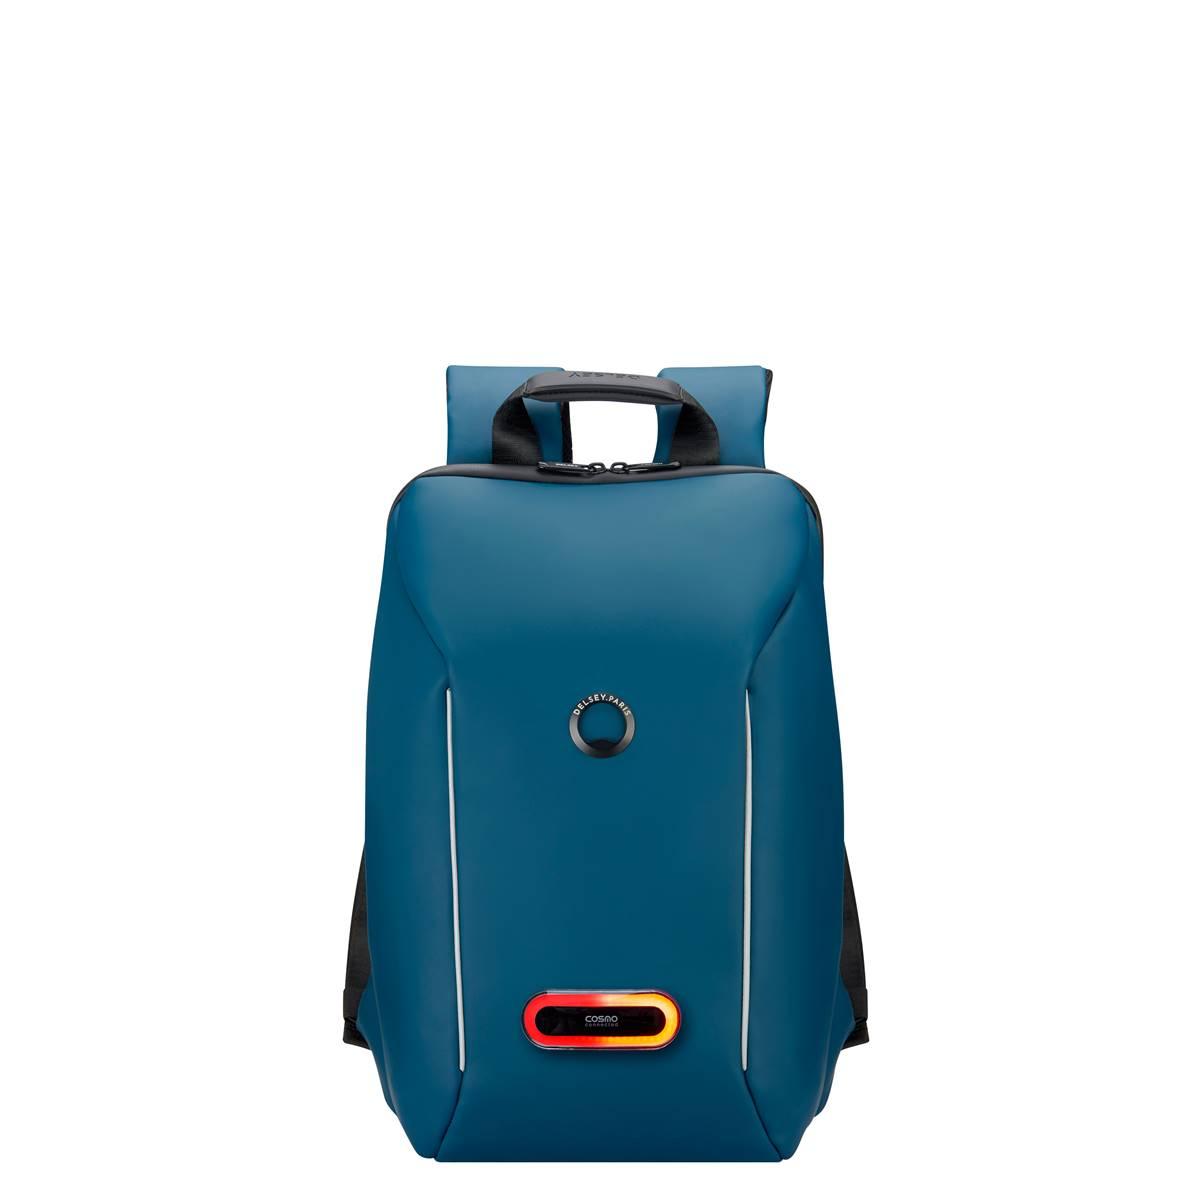 COSMO-SECU-BLUEx1200